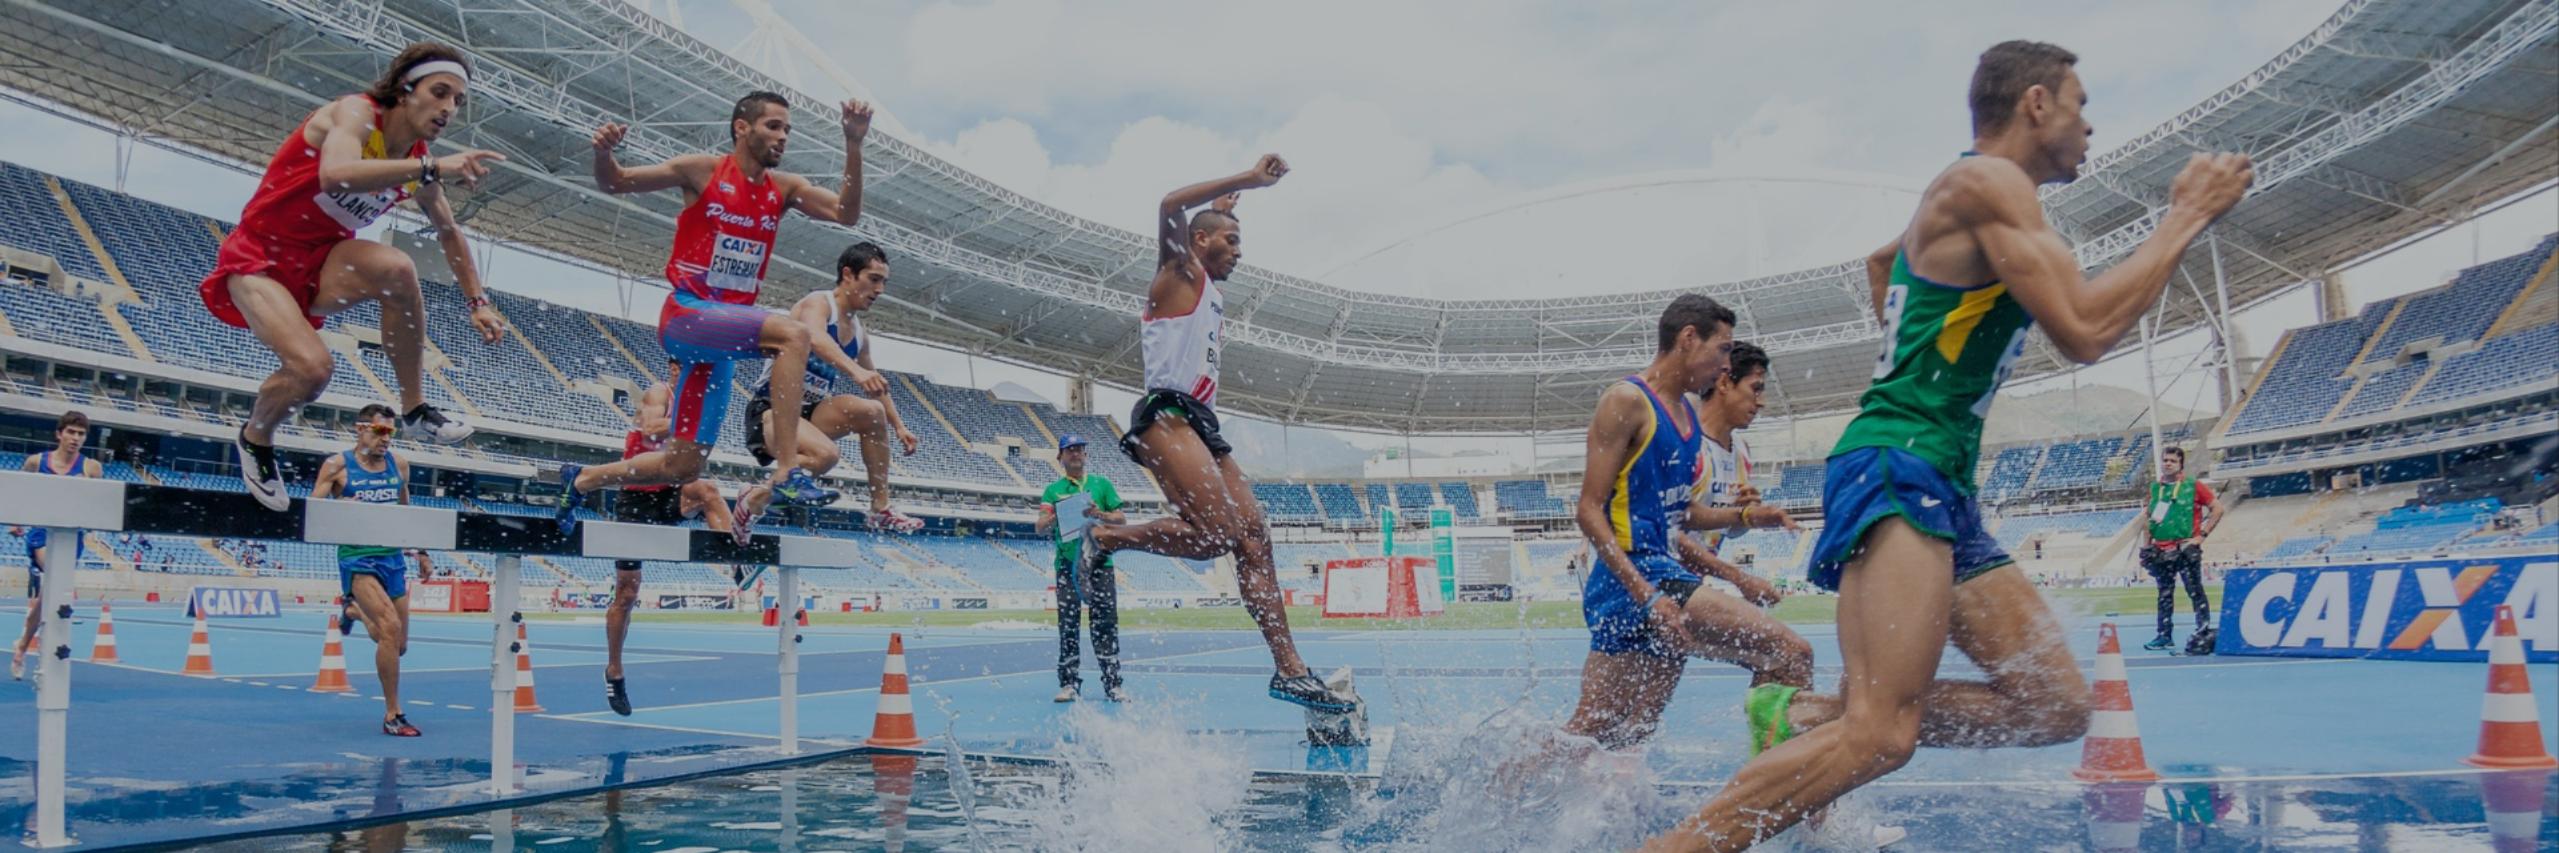 Strength Training for Endurance Athletes Part I: Injury Risk Reduction